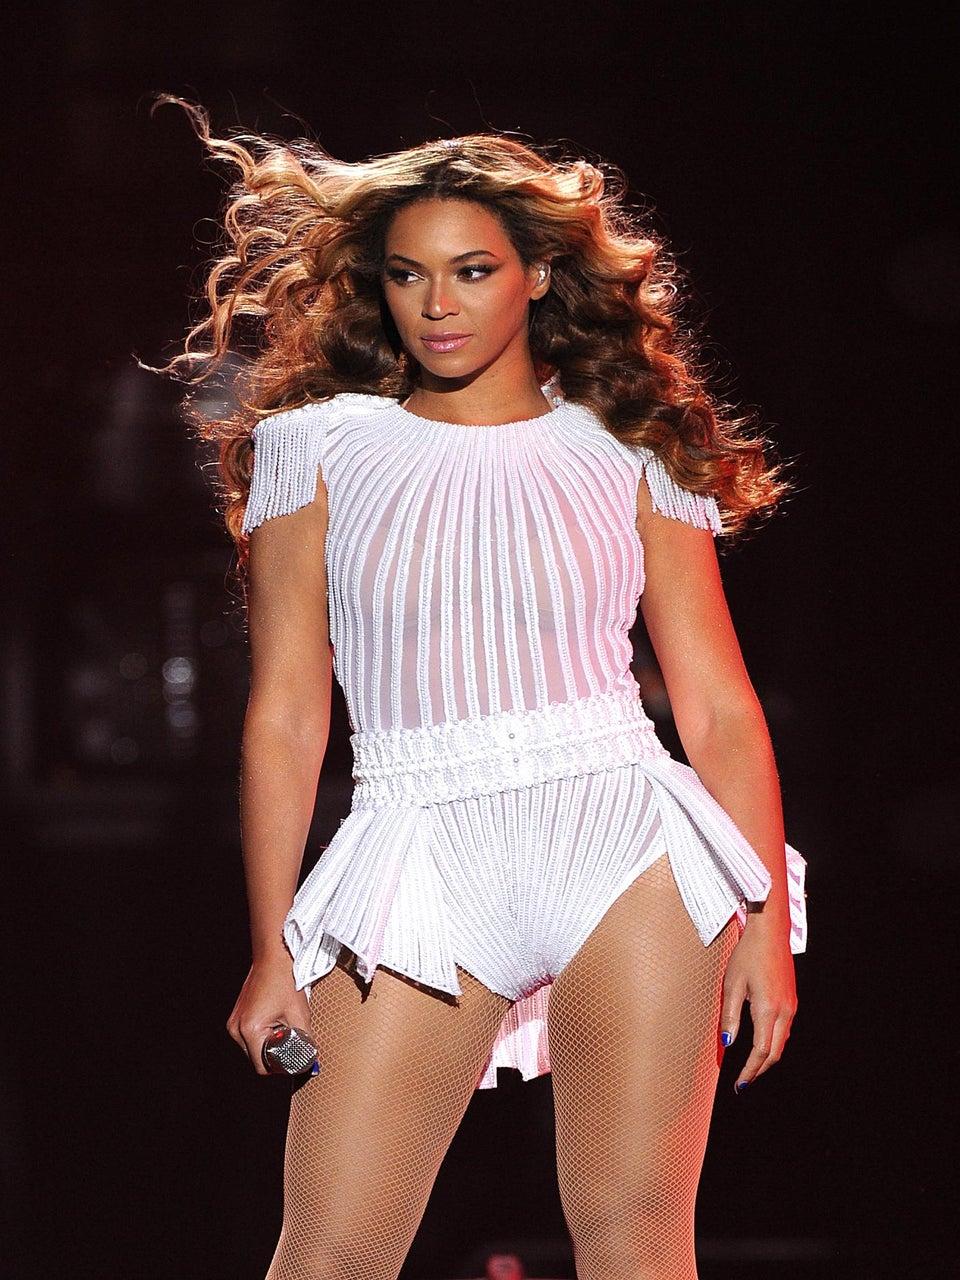 Coffee Talk: Beyoncé Shares Handwritten Apology for Canceled Concert